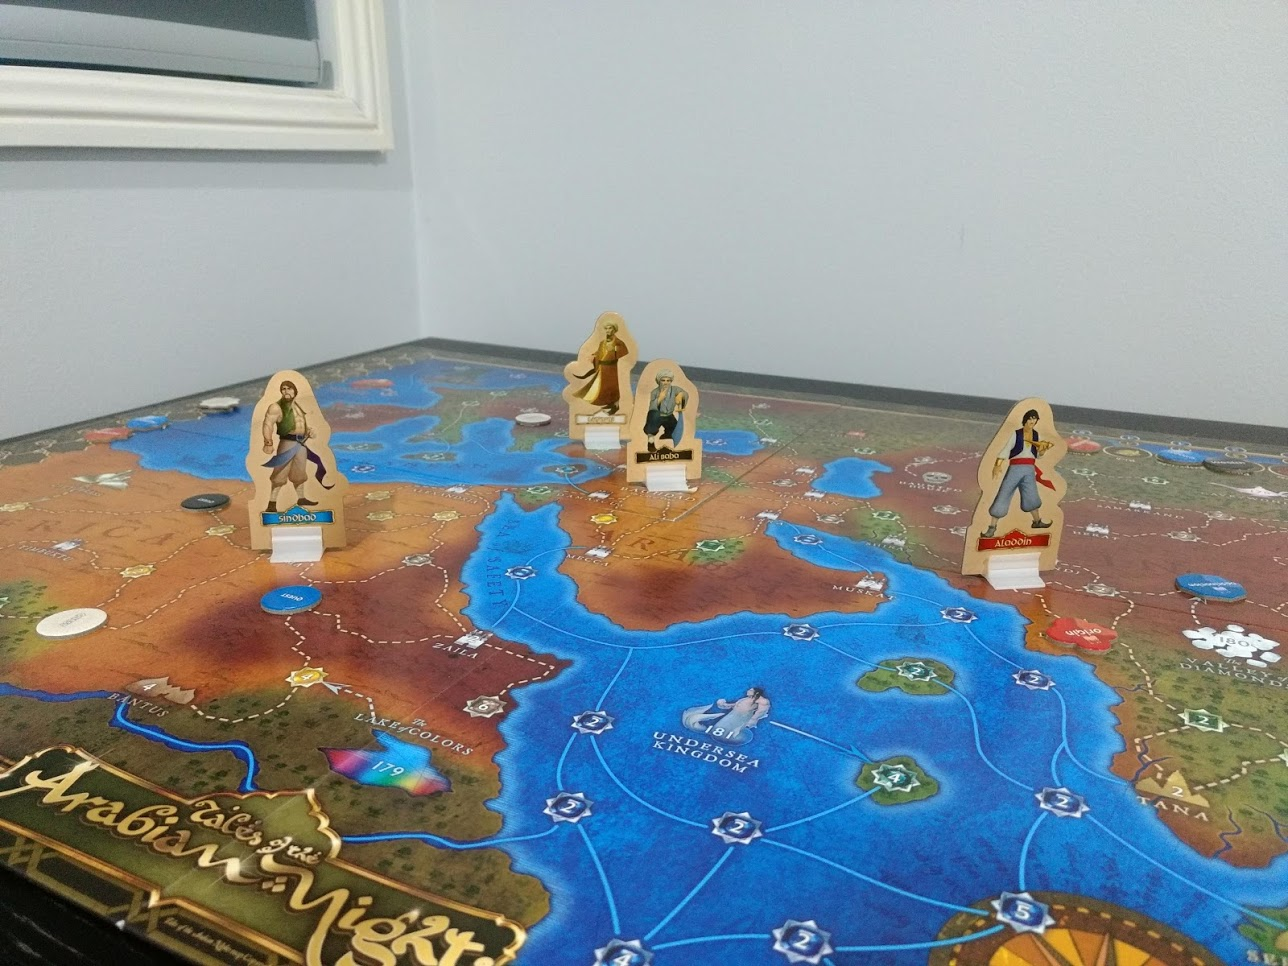 Board of Tales of the Arabian Nights, with cardboard standees of Sinbad, Aladdin, Ali Baba.